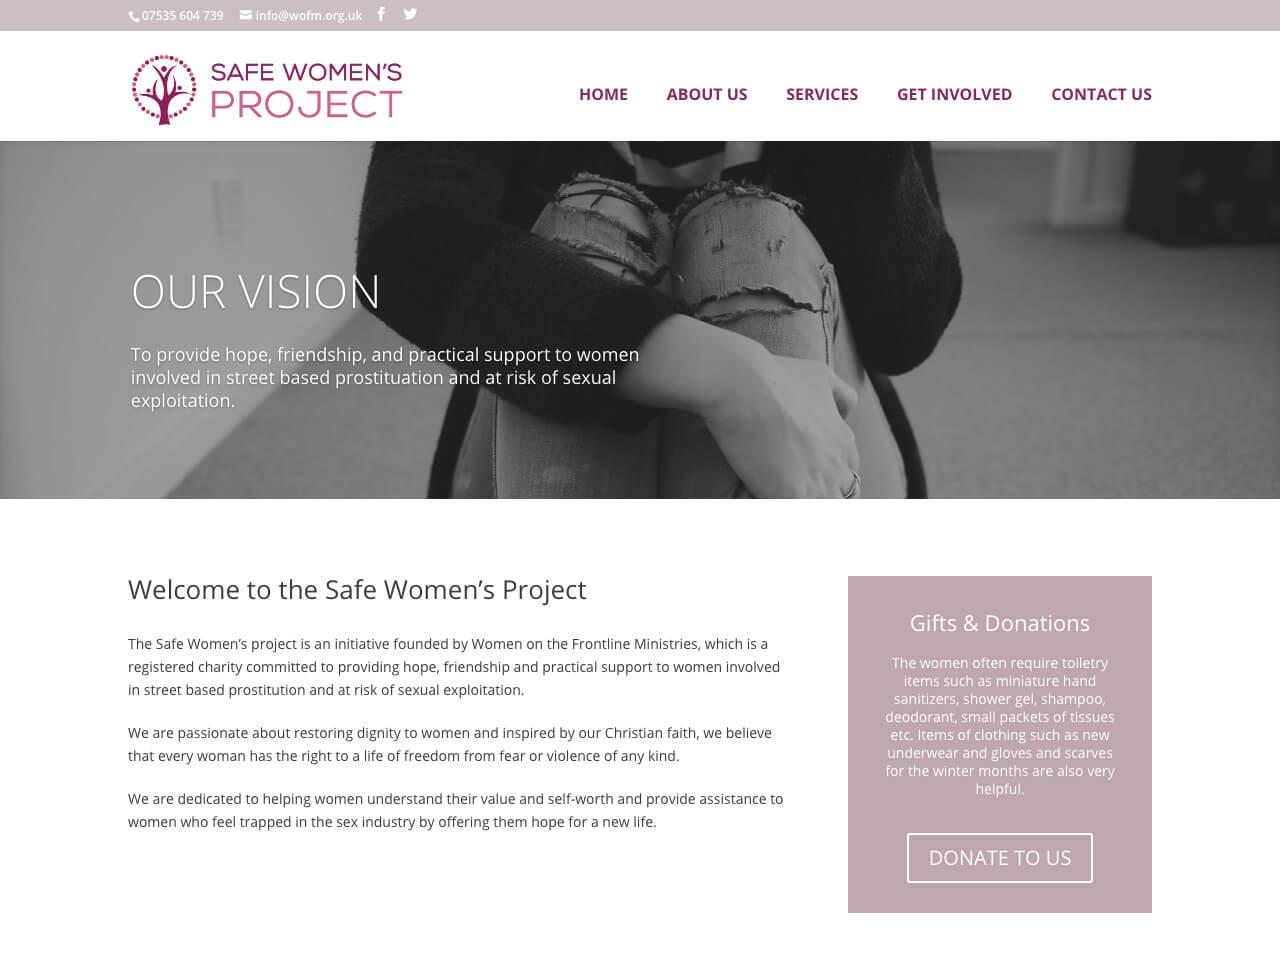 safewomensproject